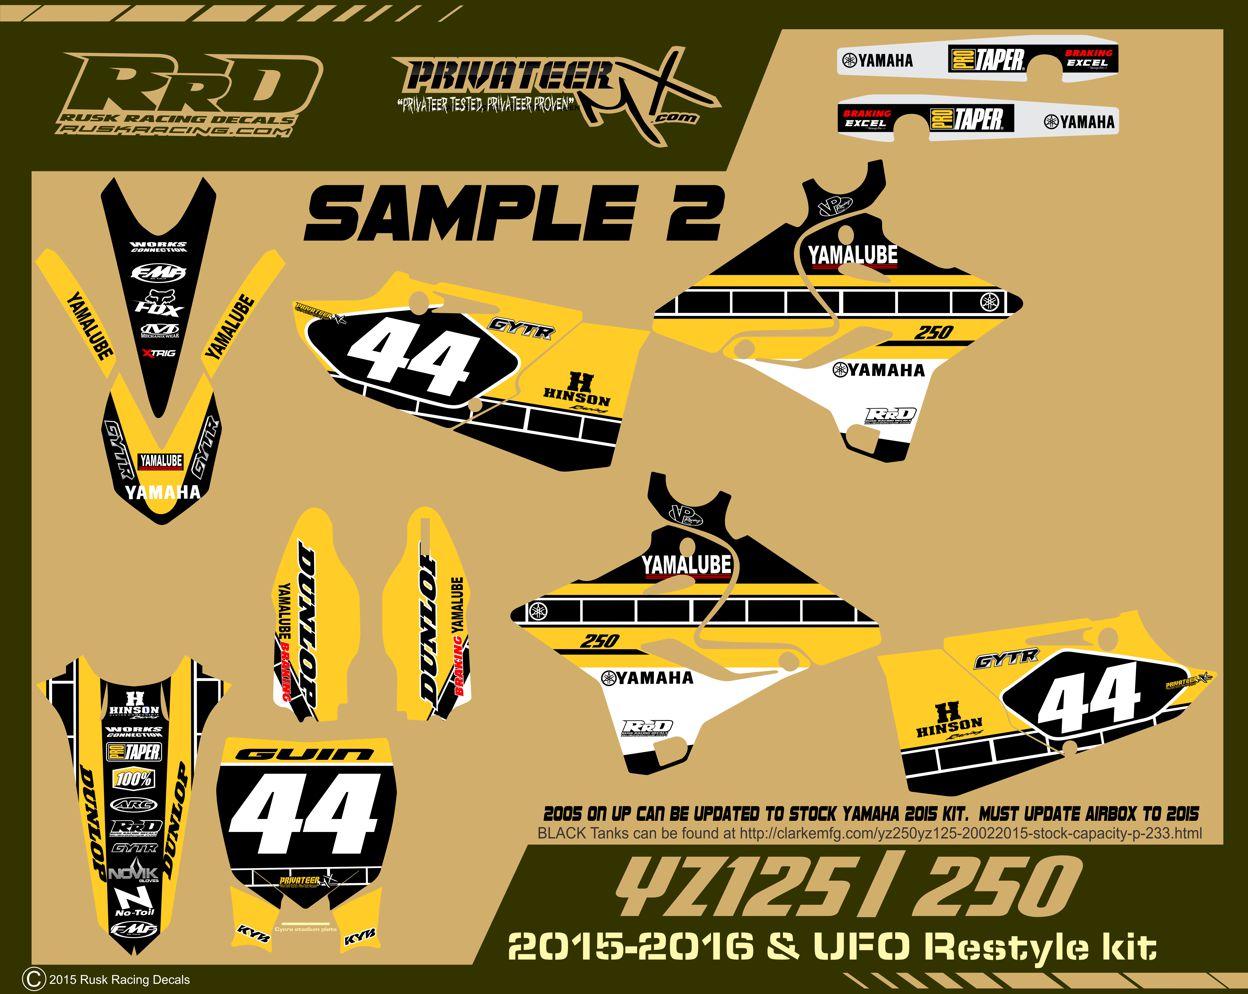 Yamaha bike sticker designs - Rusk Racing Custom Motocross Graphics And Decals Thick Stickers Yz125 Yz250 Yamaha Full Graphics Kit